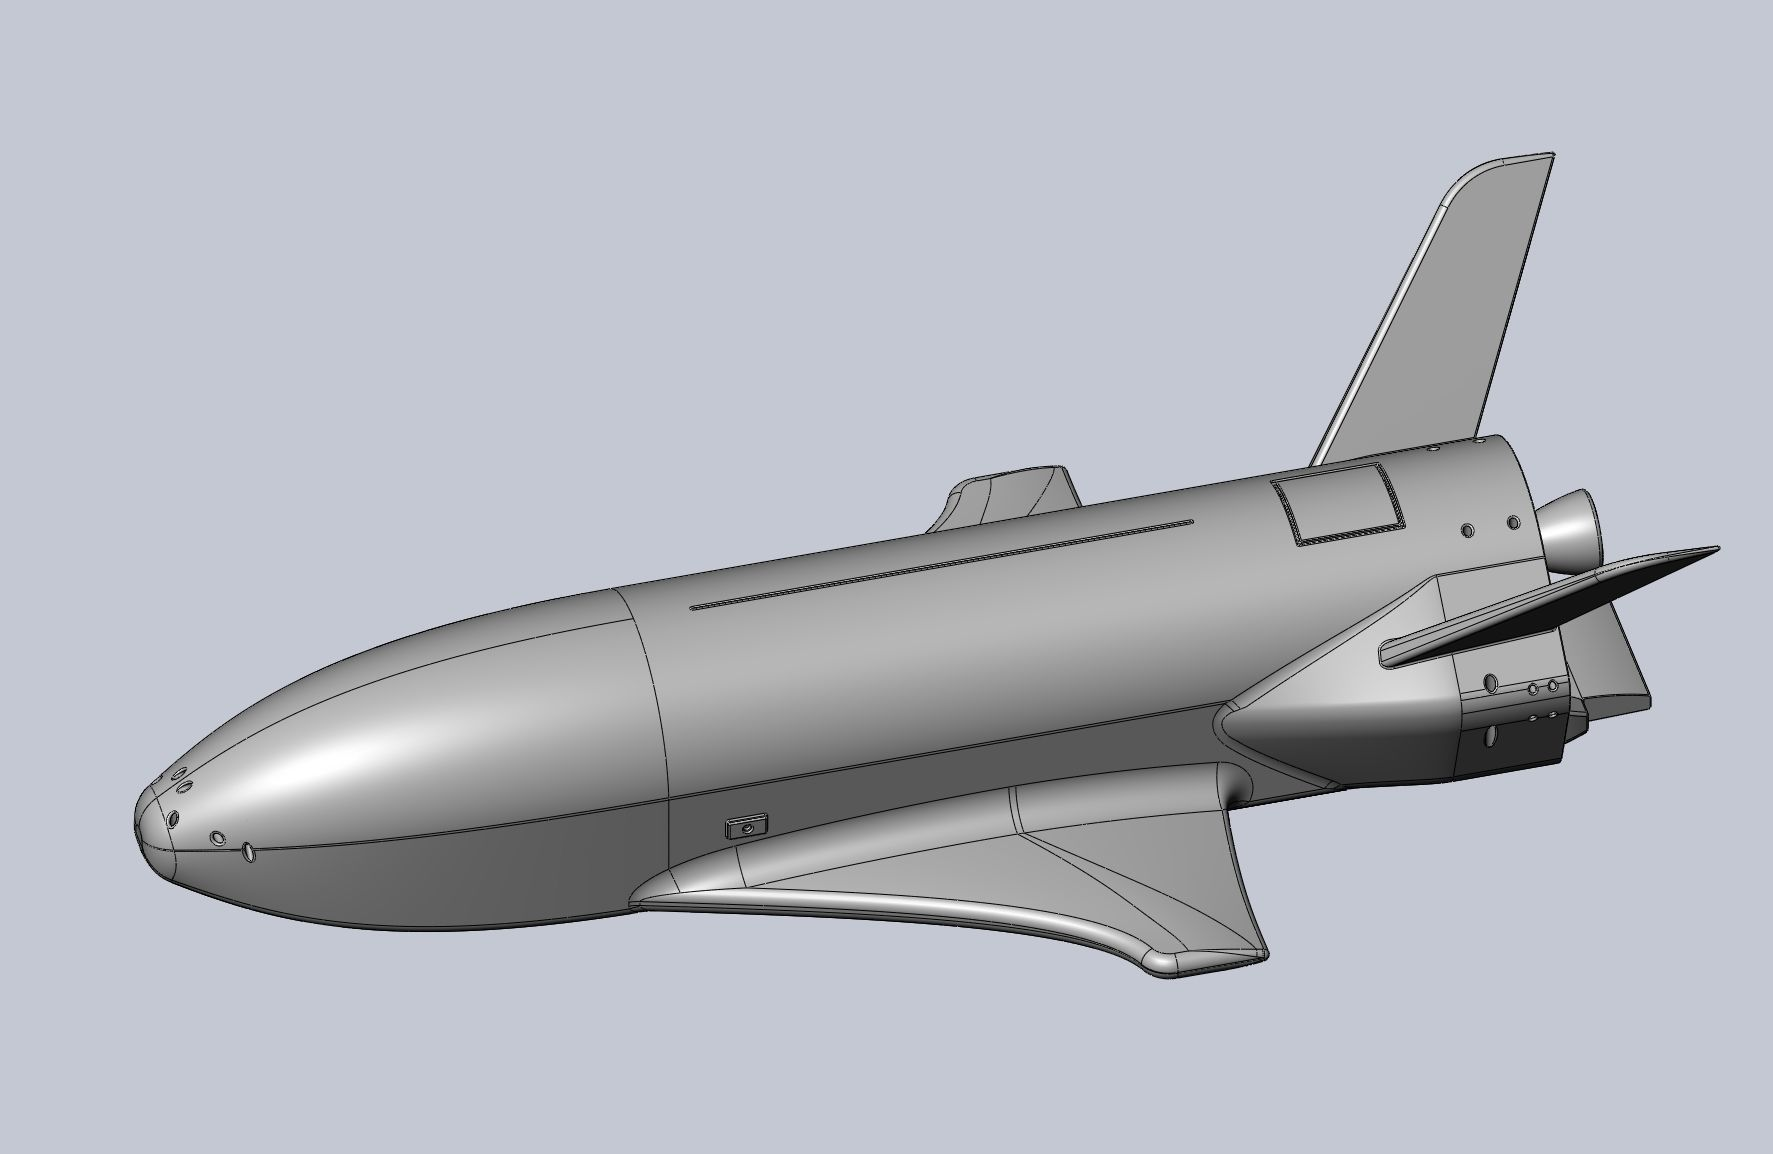 Boeing X-37B OTV Experimental Spaceplane Miniature